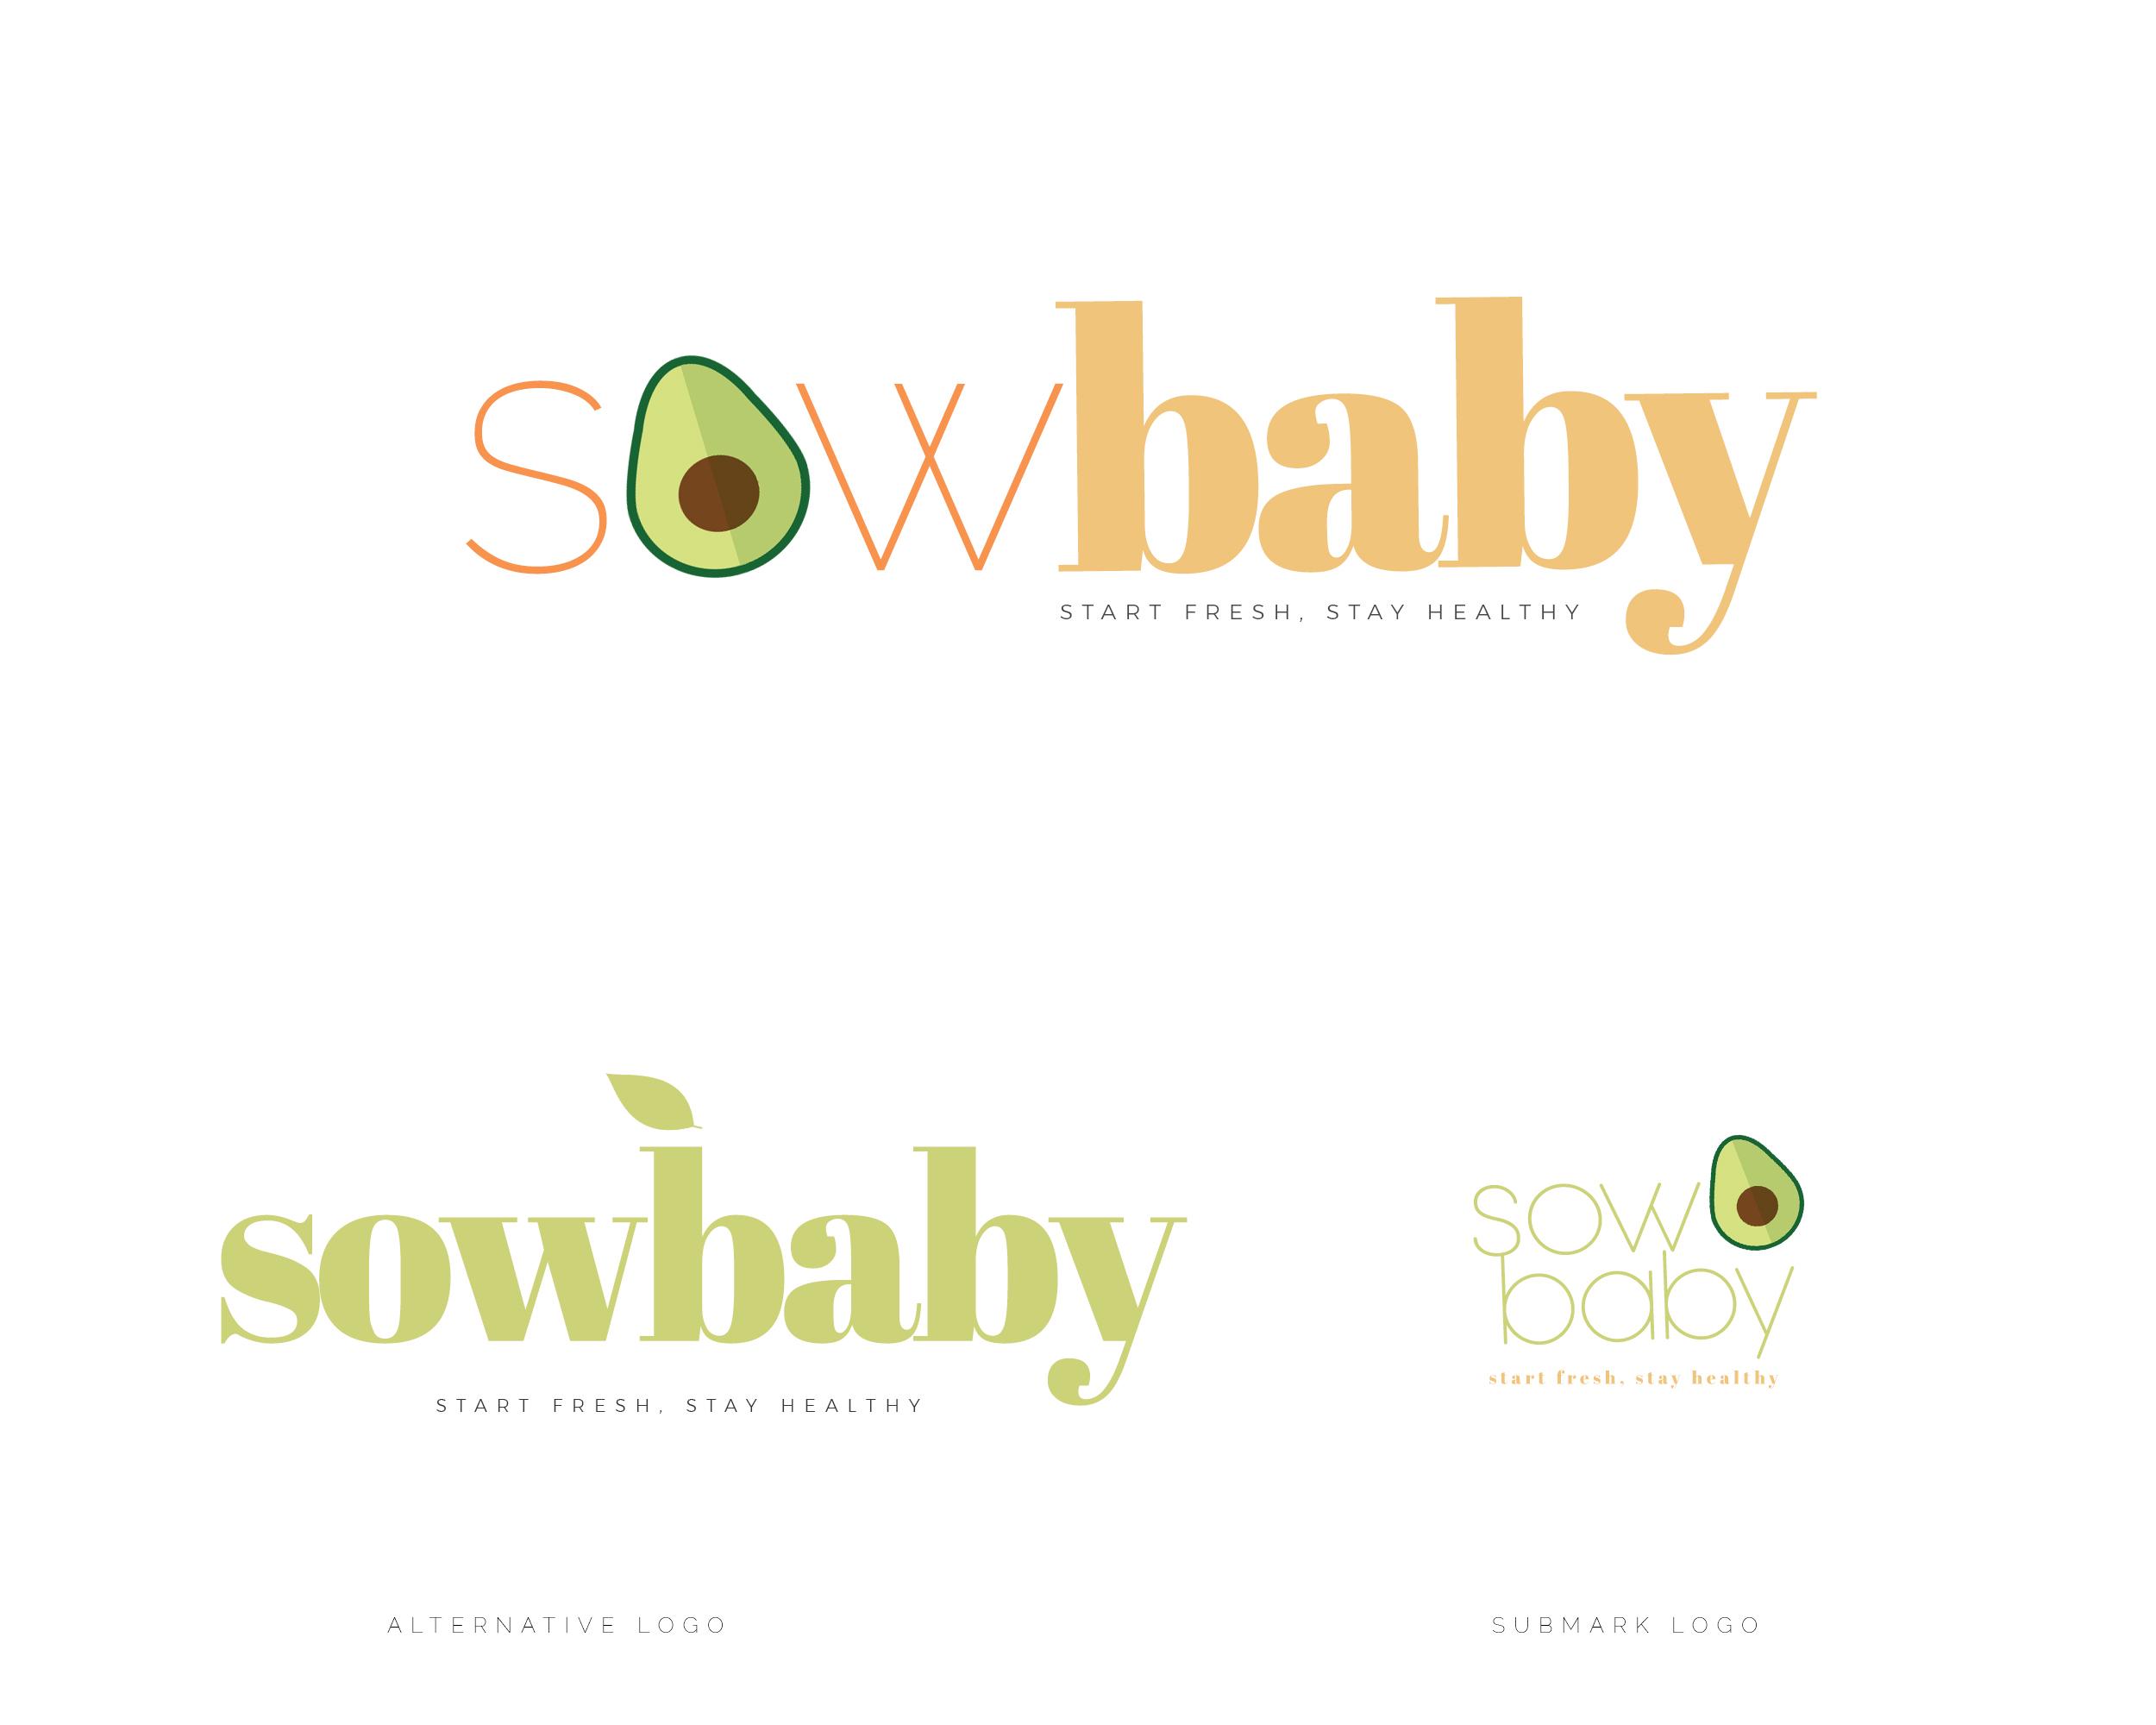 sow baby logo 2 alt.jpg